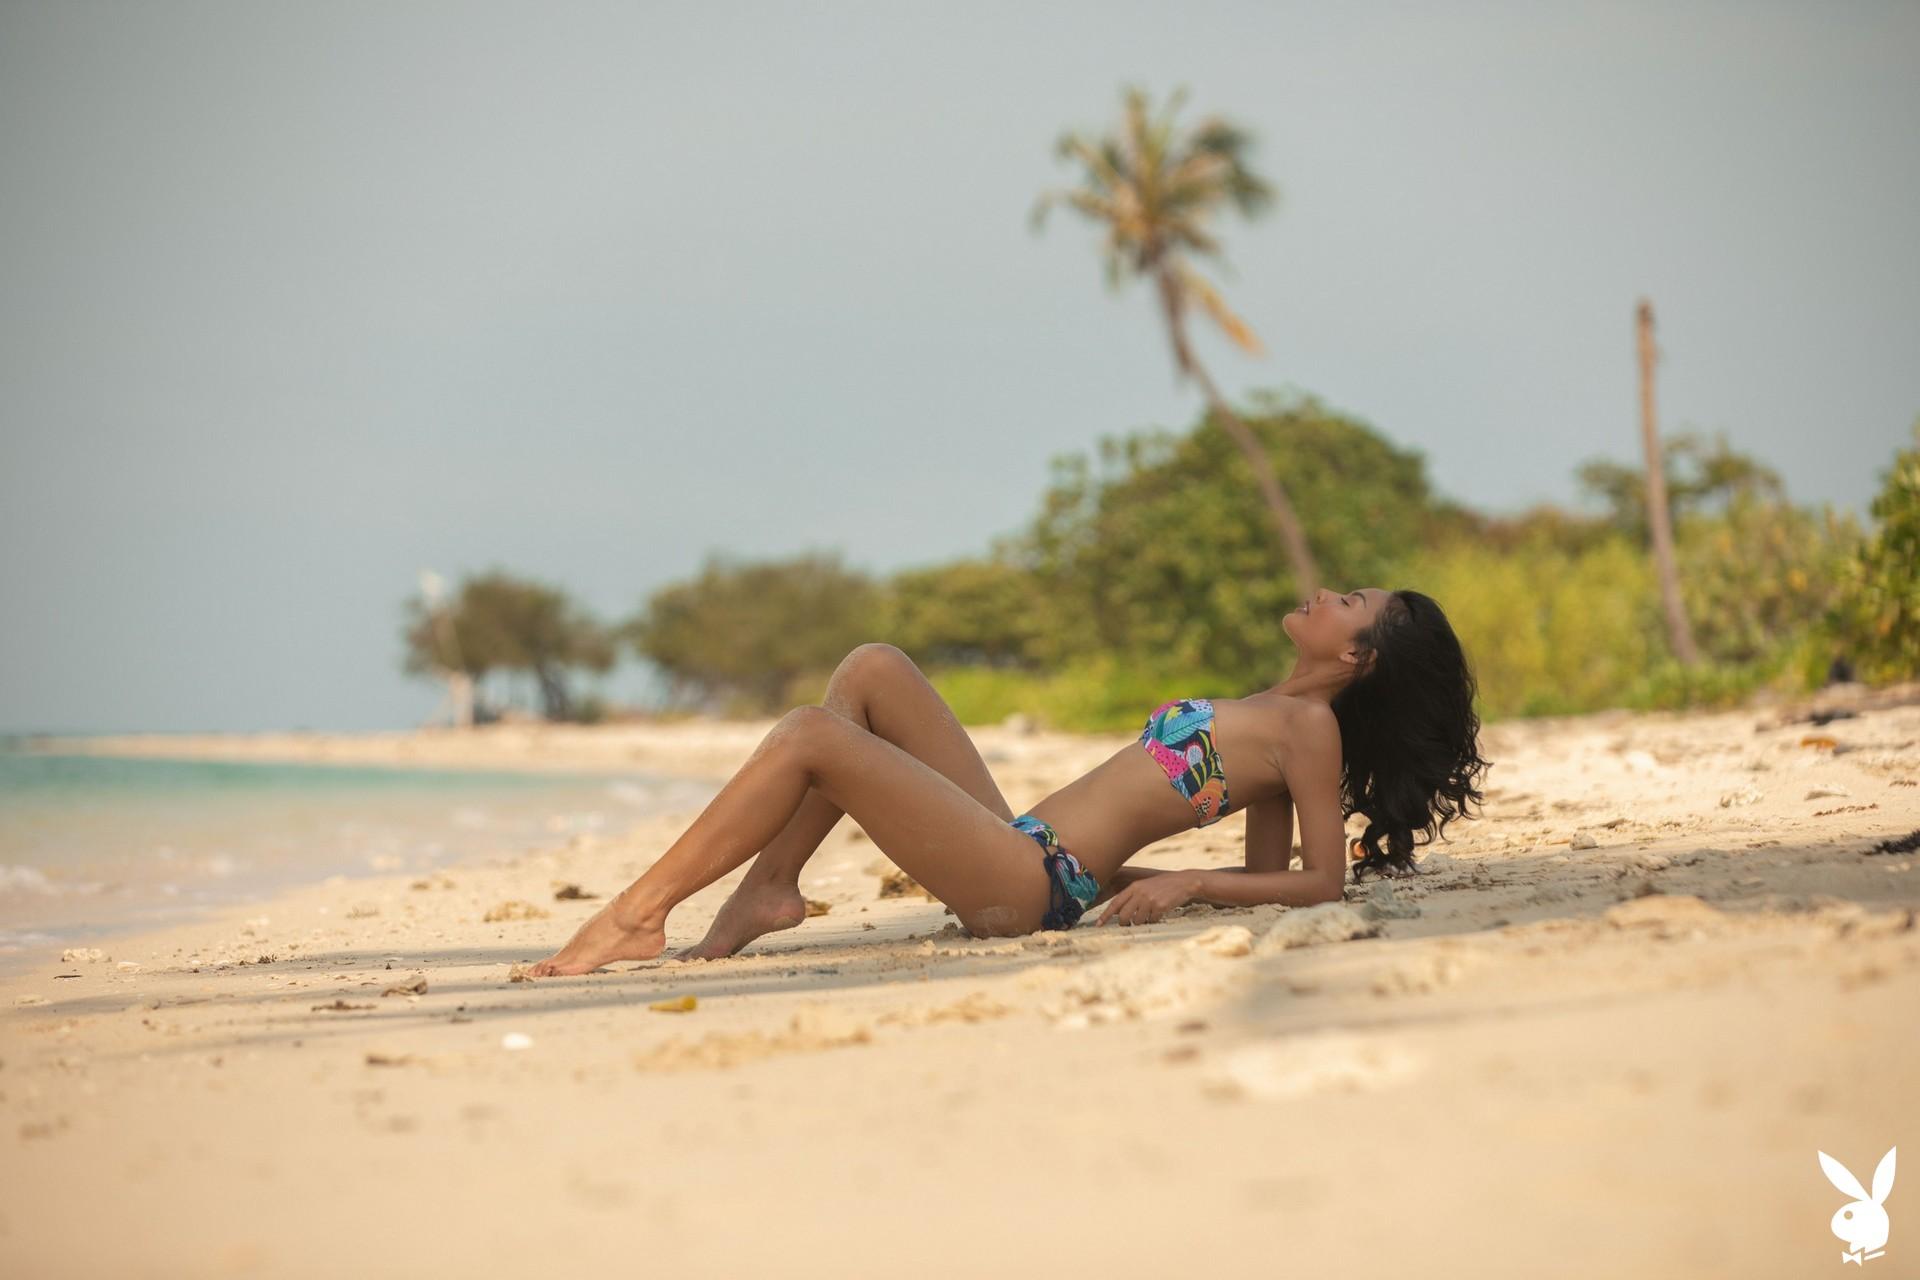 Magen Hana In Island Mentality Playboy Plus (4)